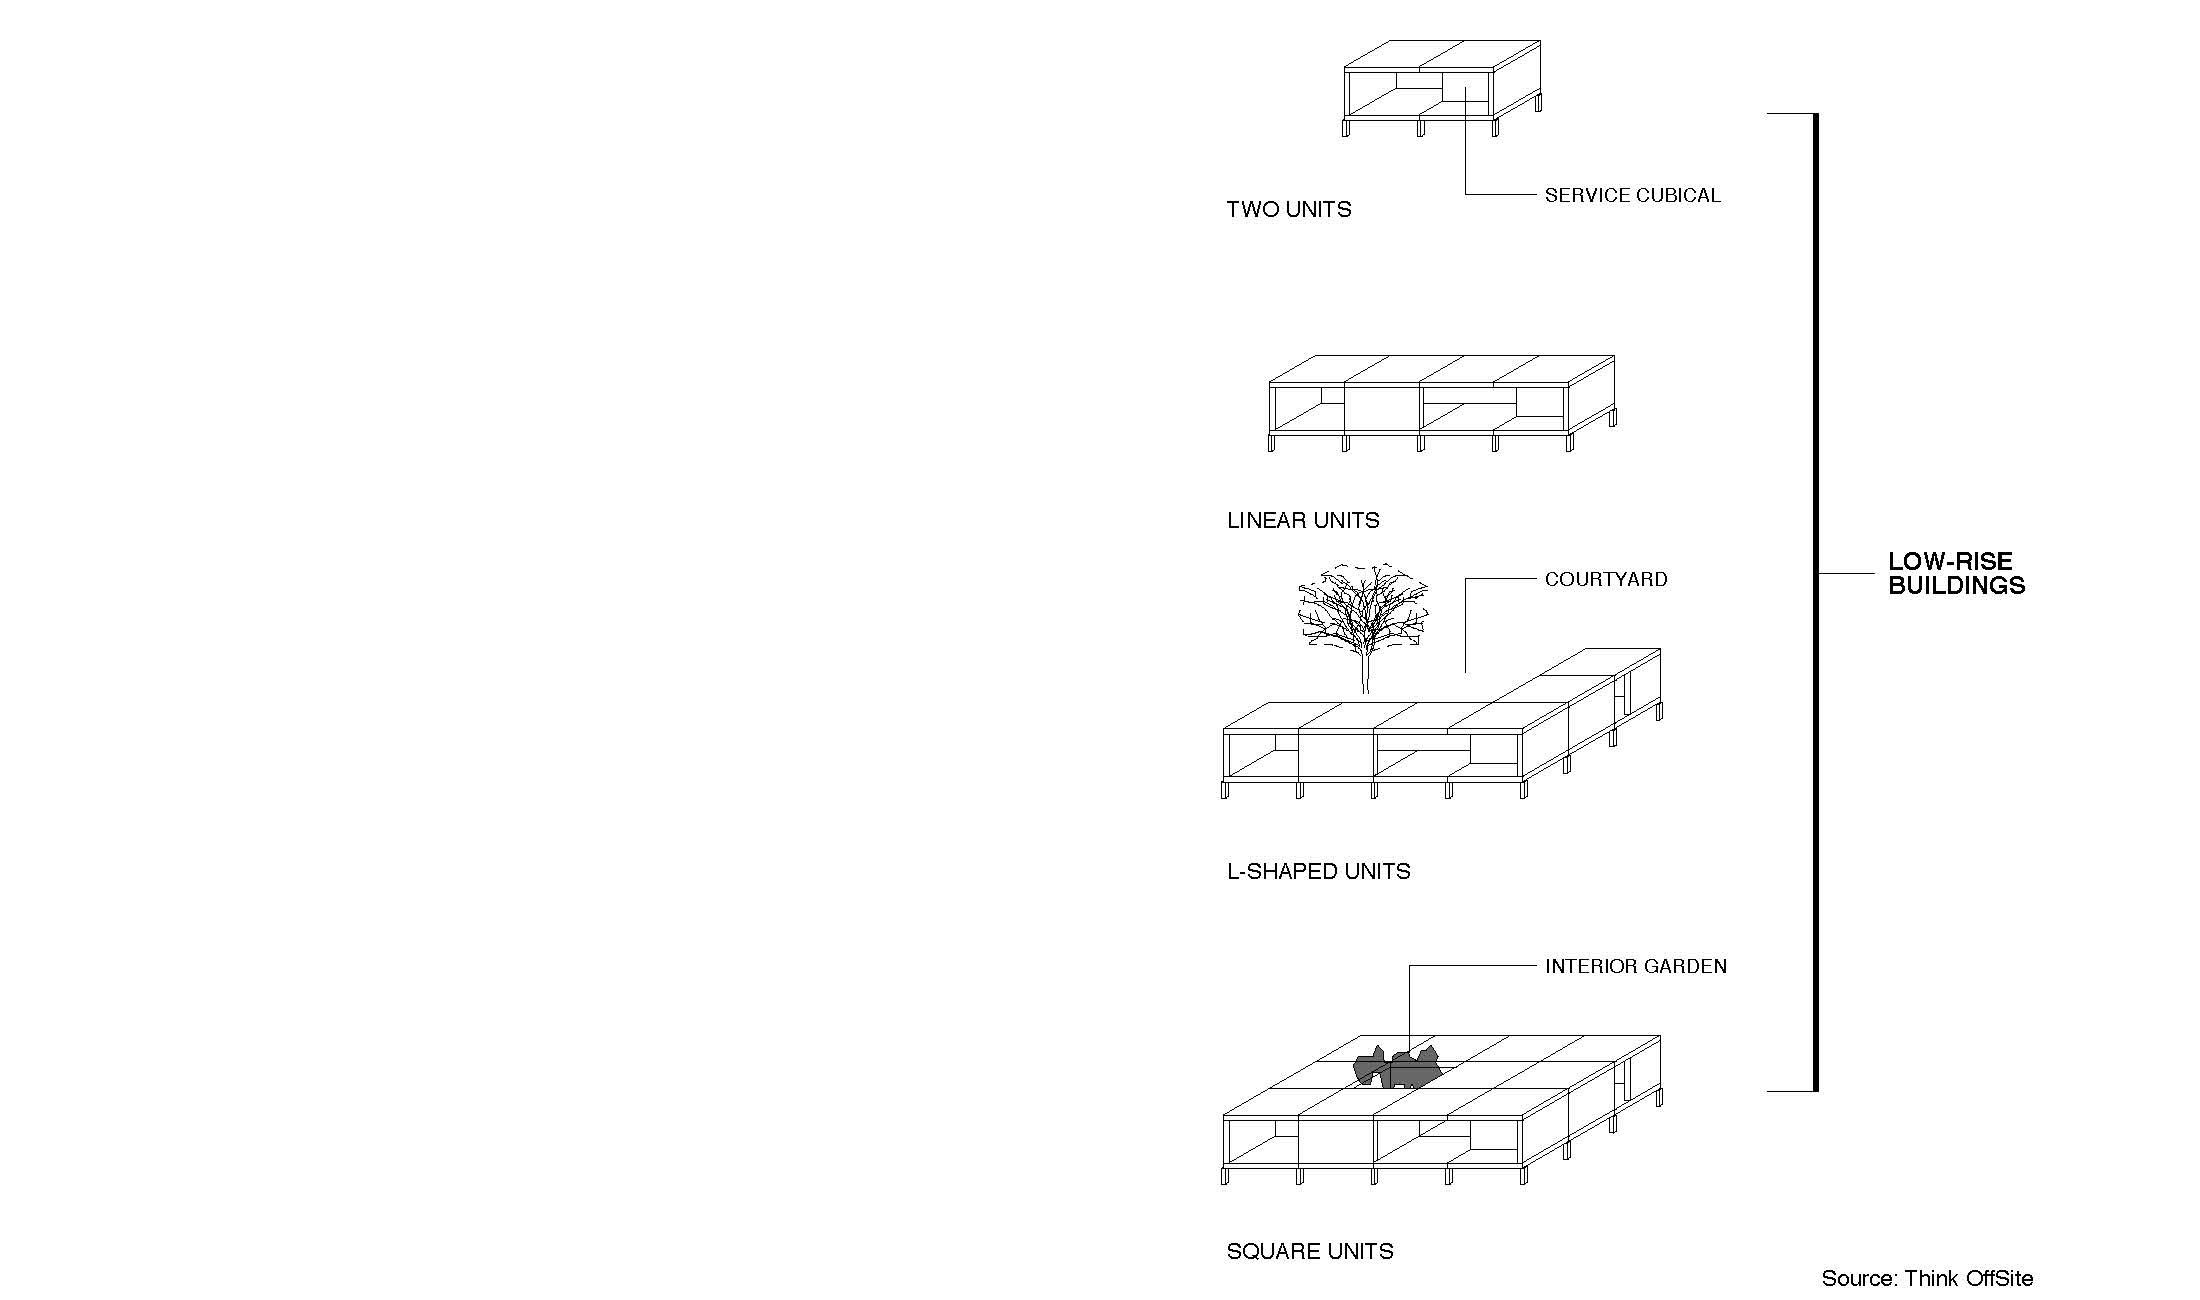 Maciunas Assessment Report 0509_Page_54.jpg